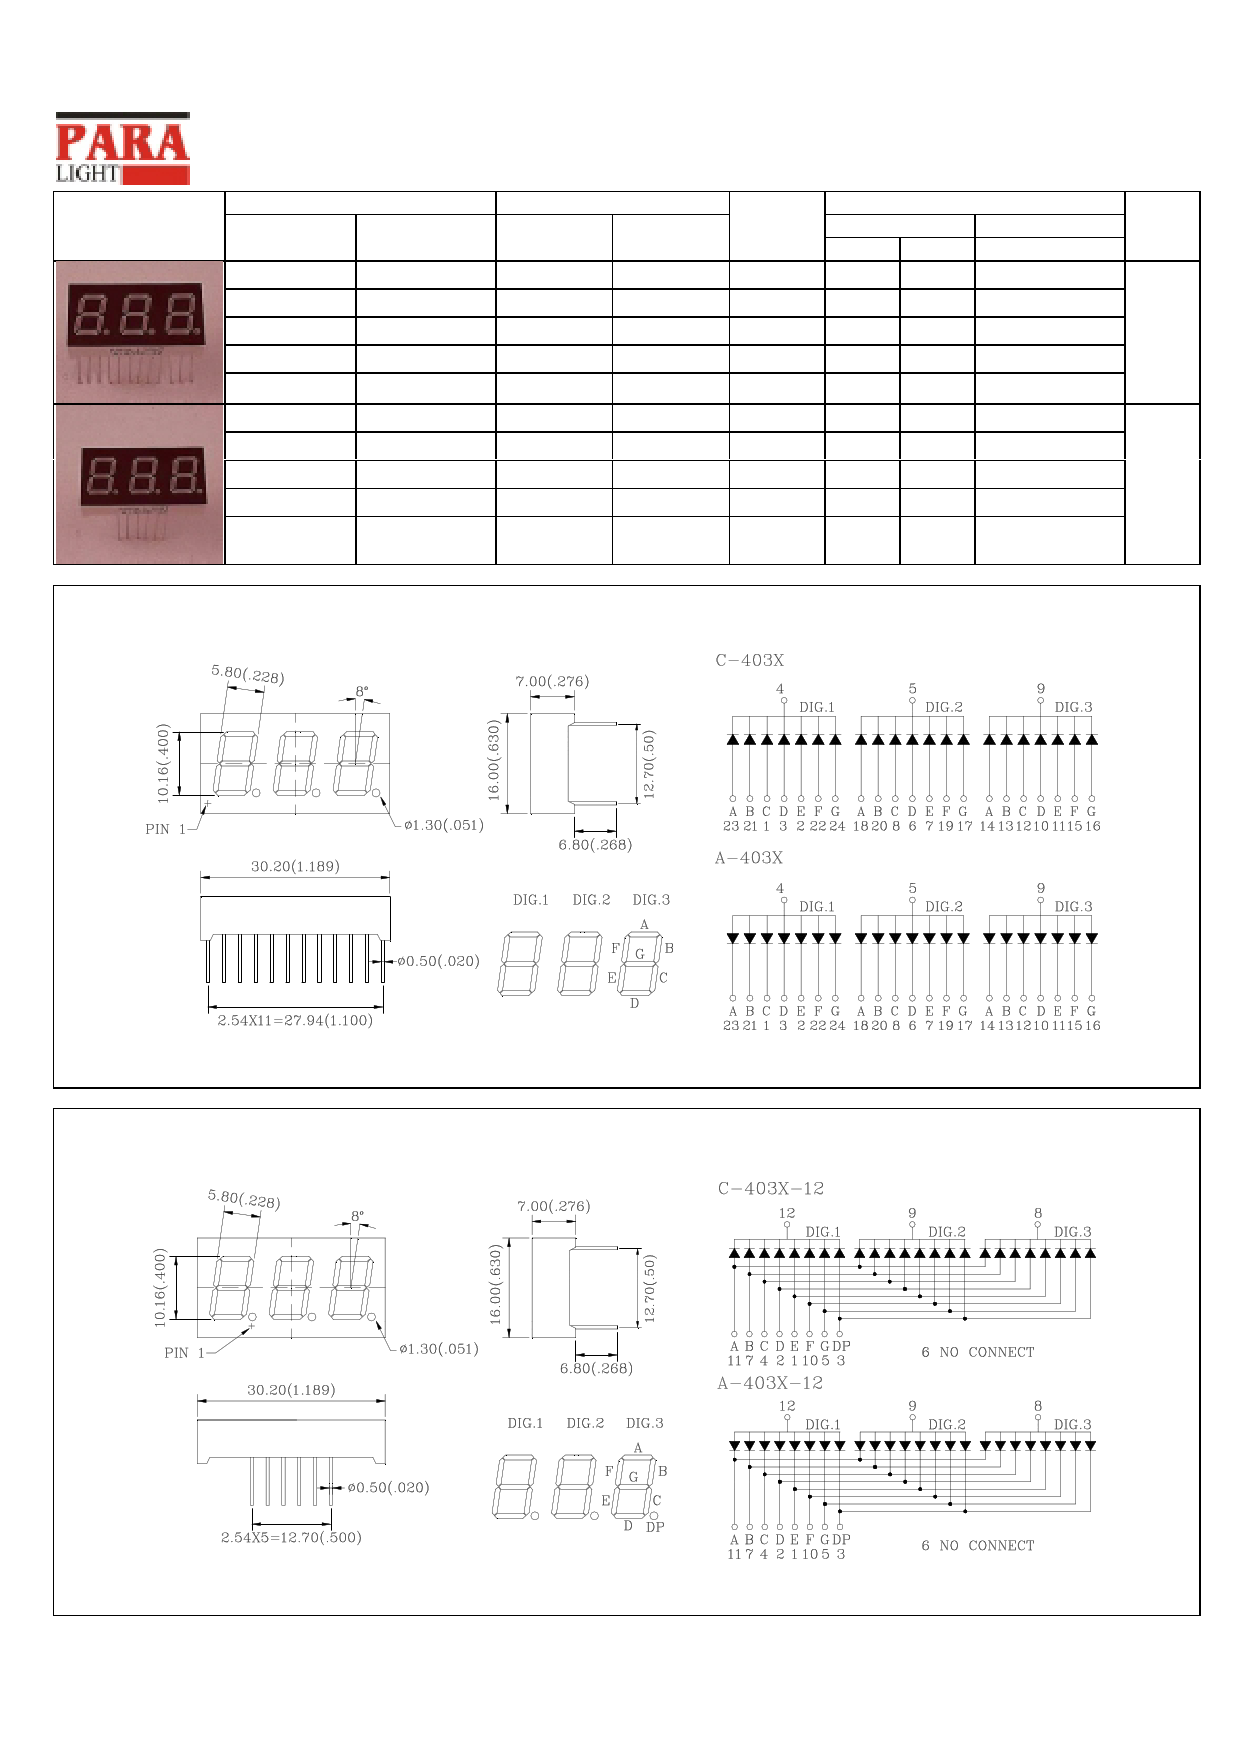 C-403SR دیتاشیت PDF